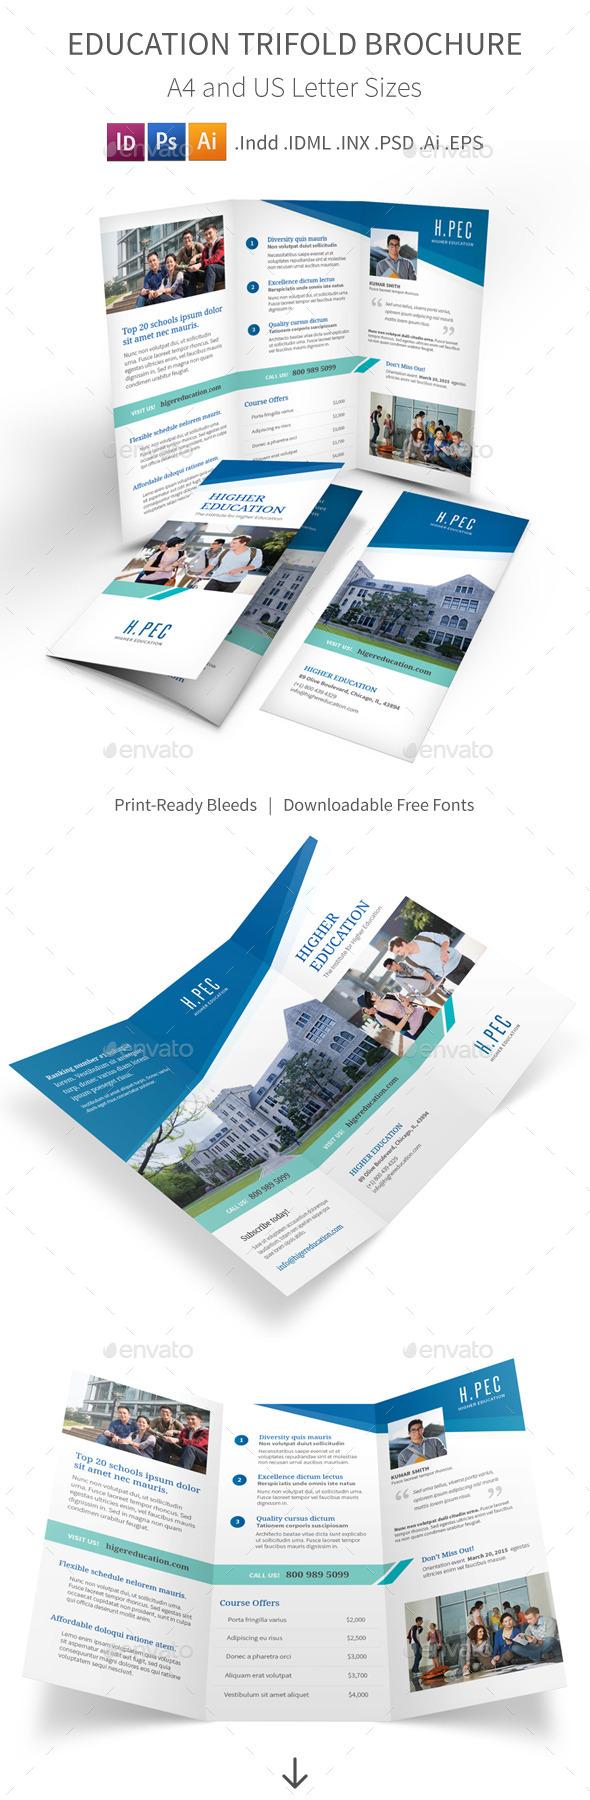 GraphicRiver Education Trifold Brochure 10397956